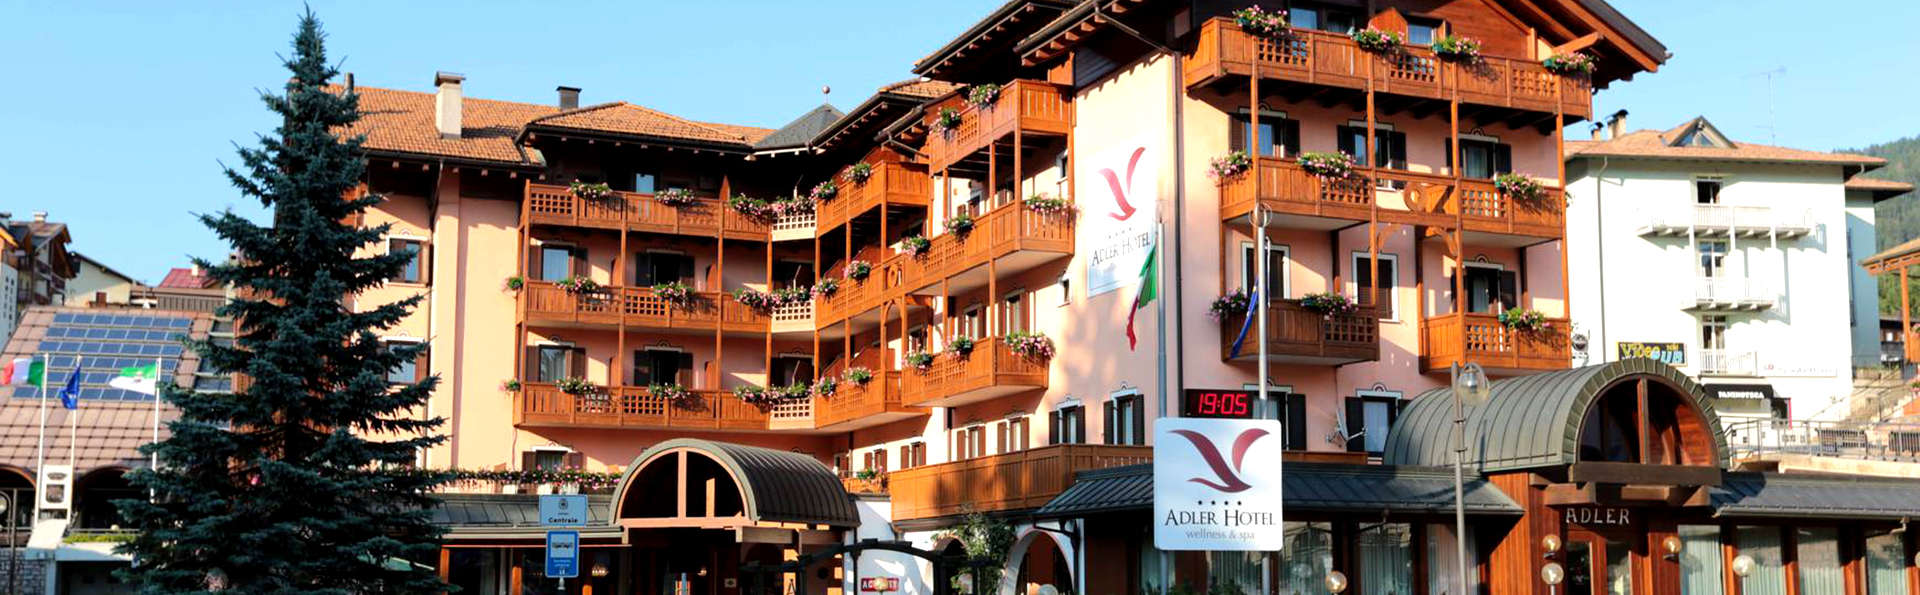 Adler Hotel Wellness & Spa - Edit_Front3.jpg